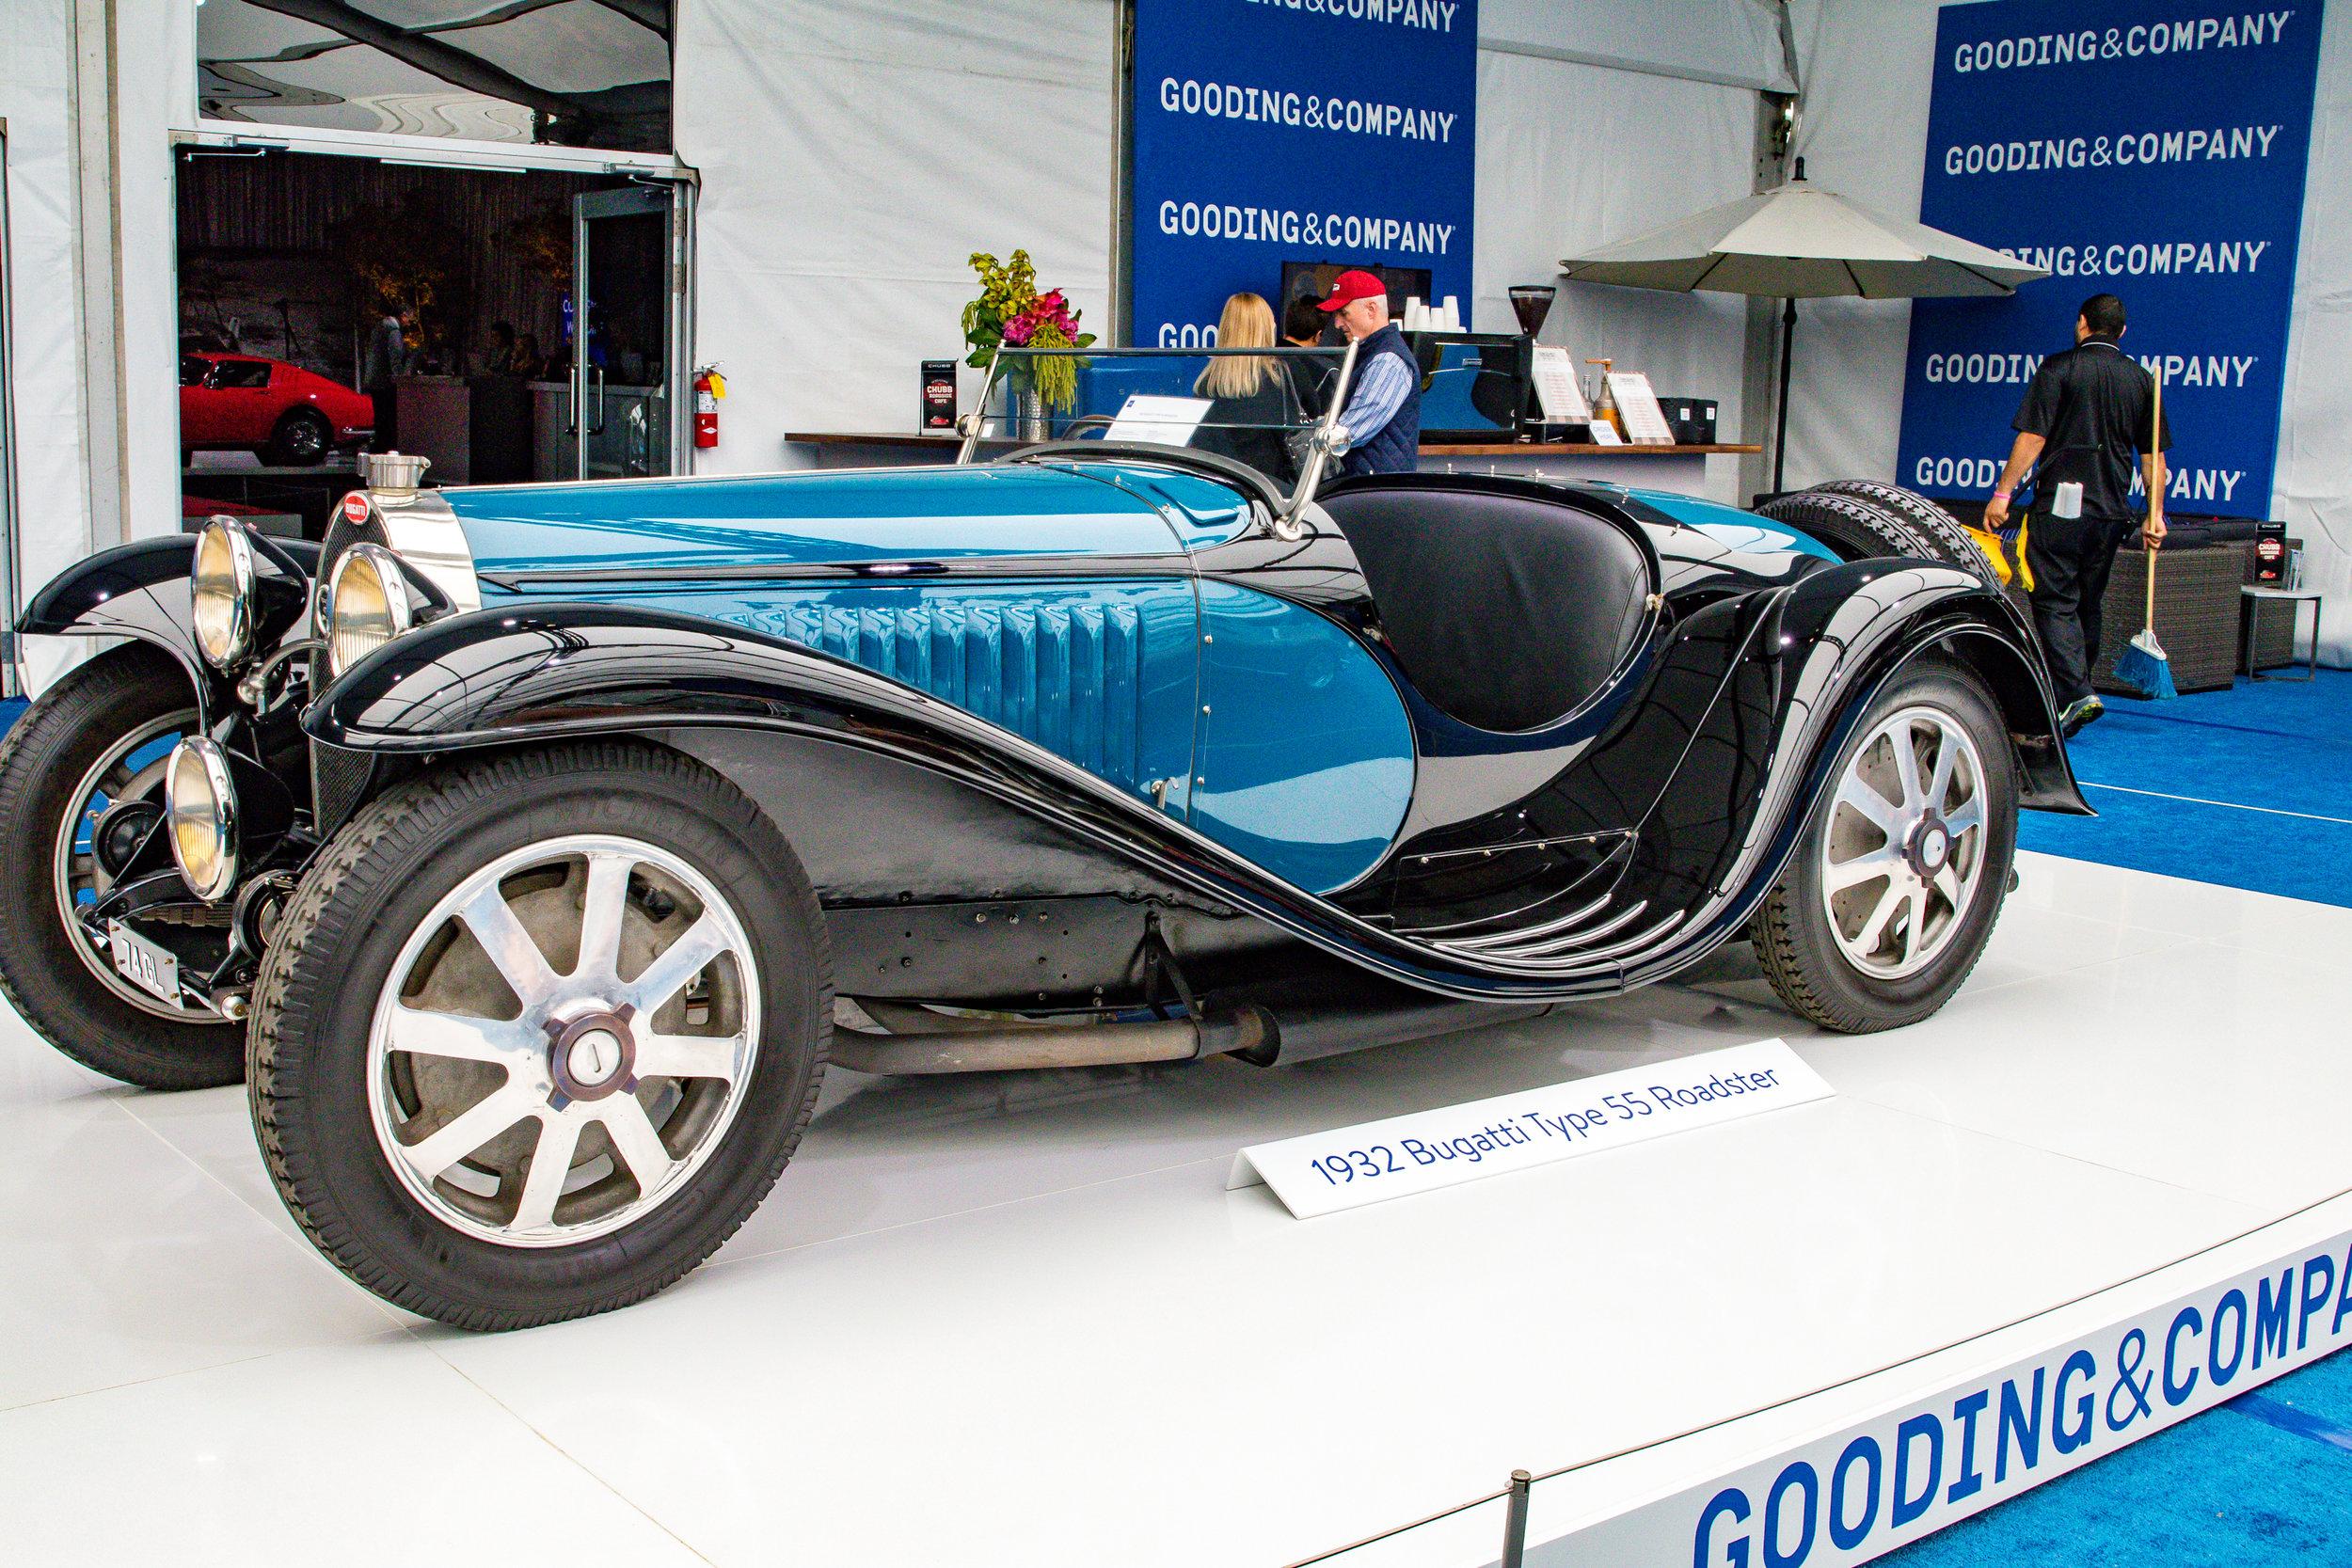 1932 Bugatti Type 55 Roadster-Sold for $10,400,000